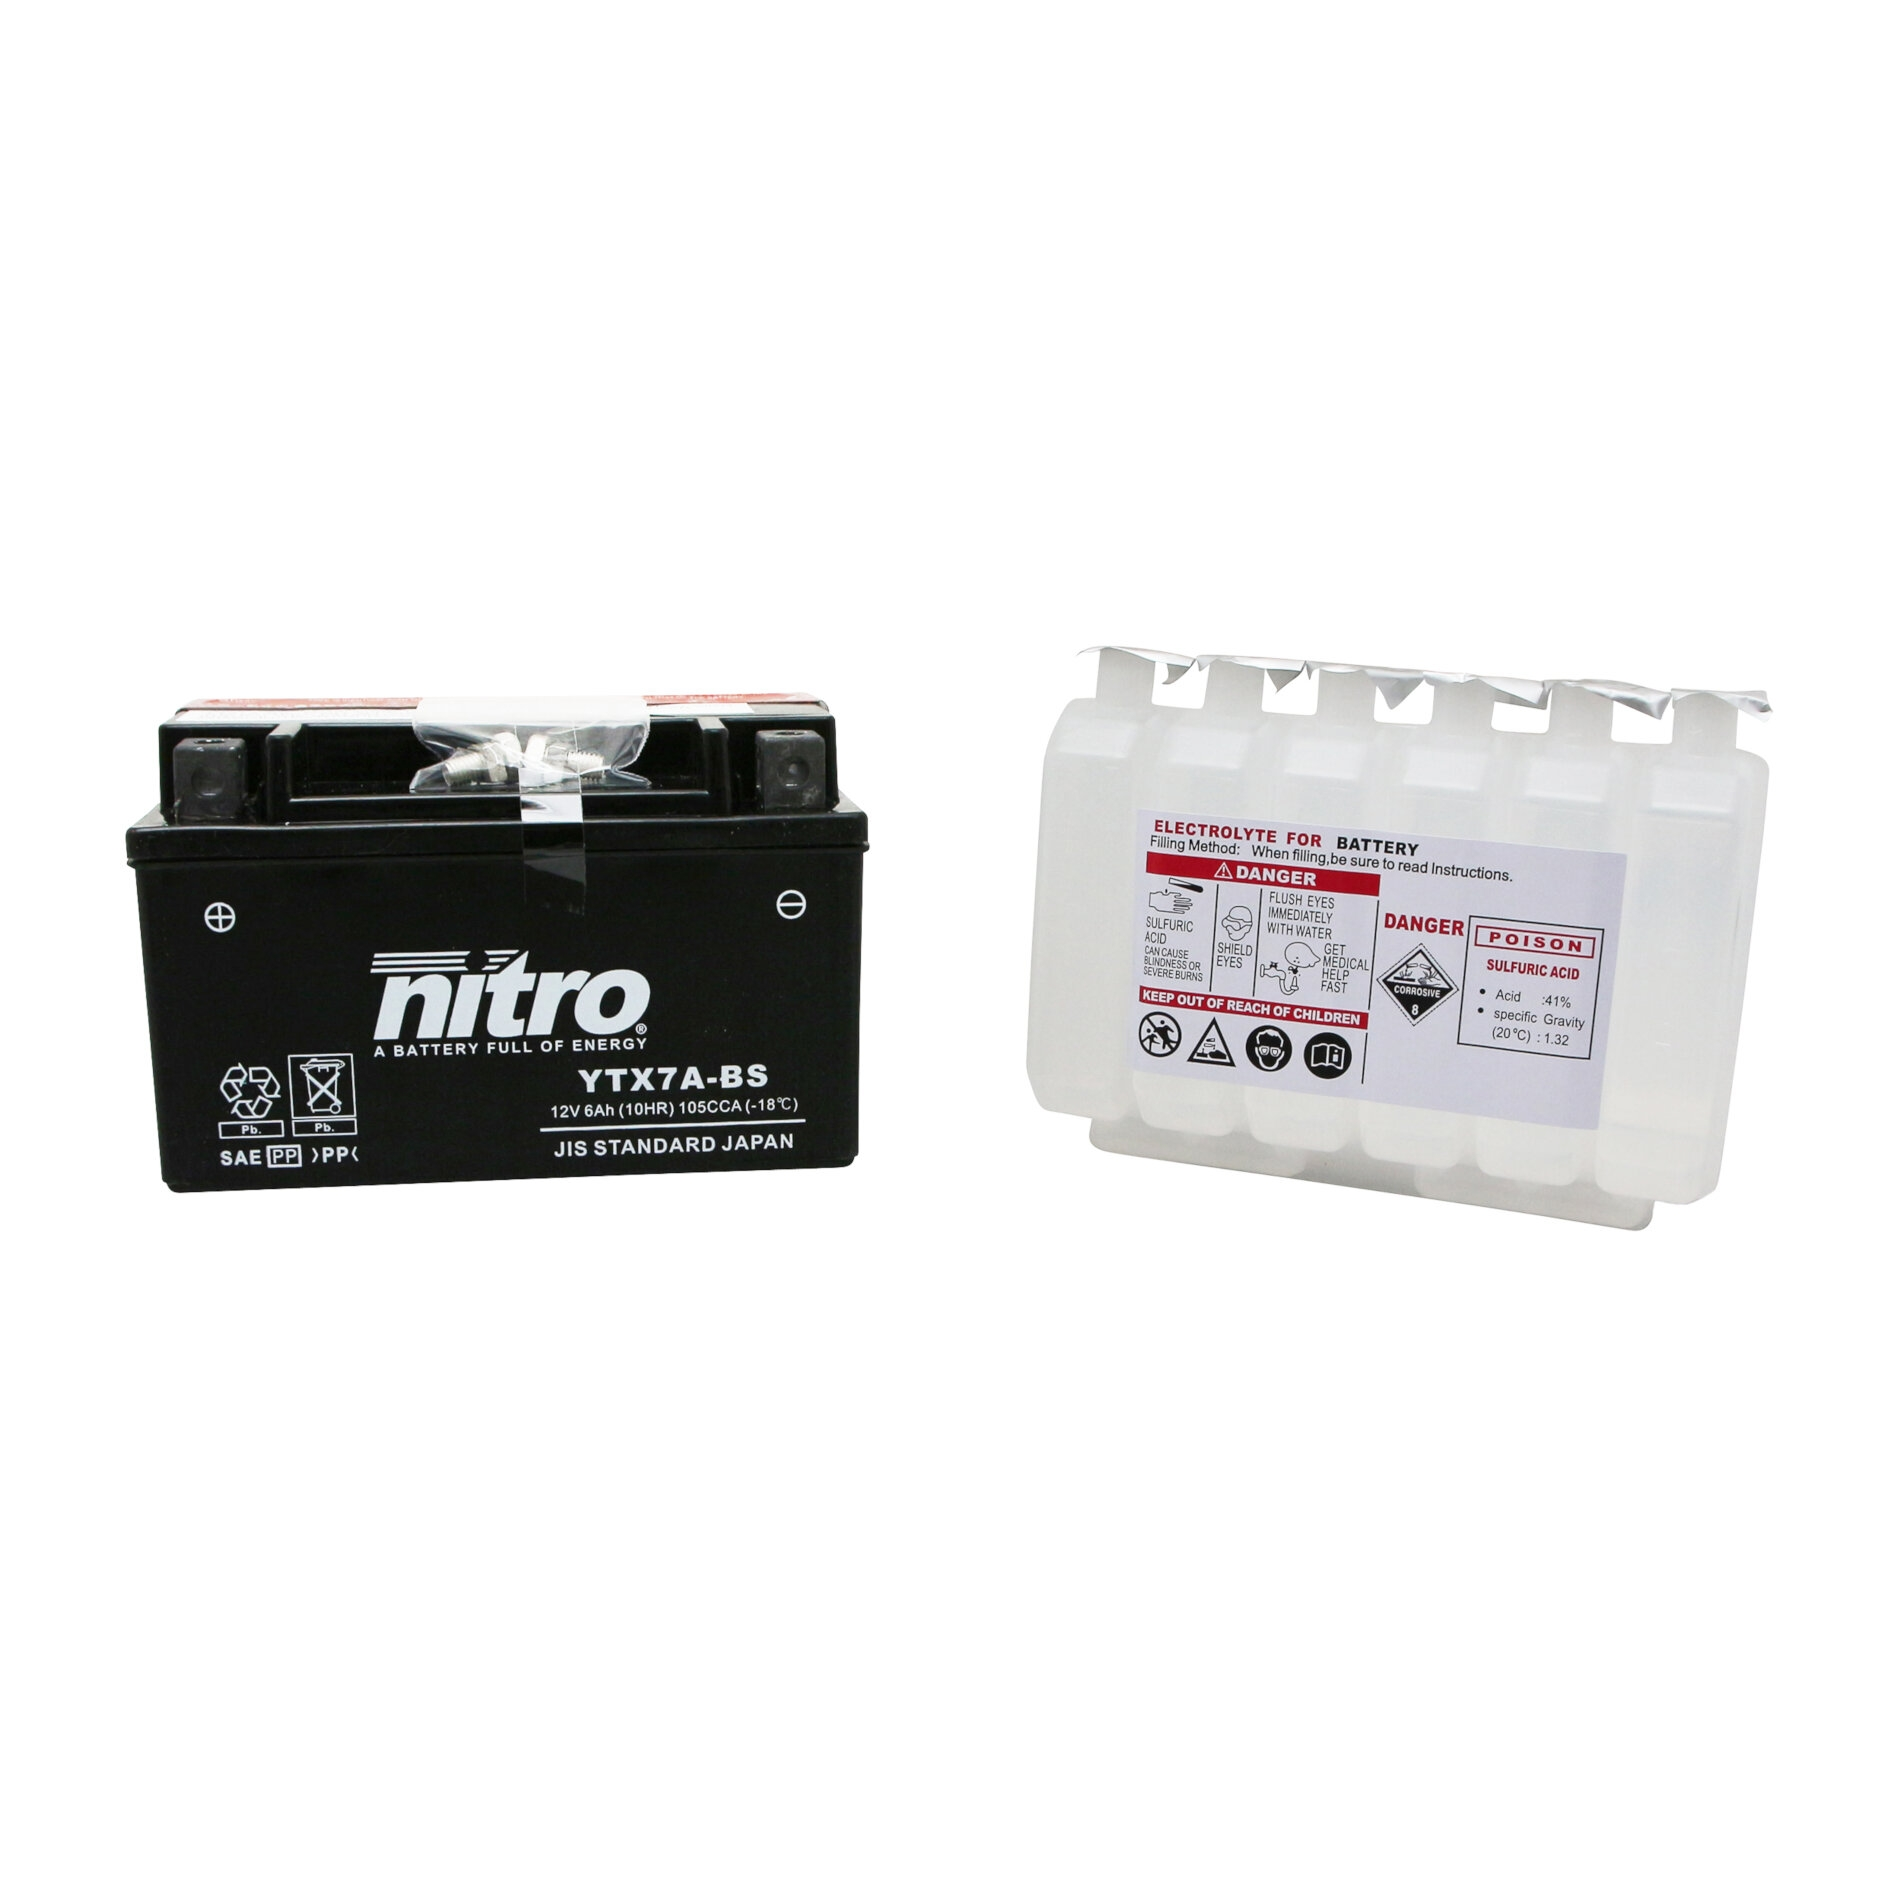 Batterie Nitro 12V 6 Ah YTX7A-BS